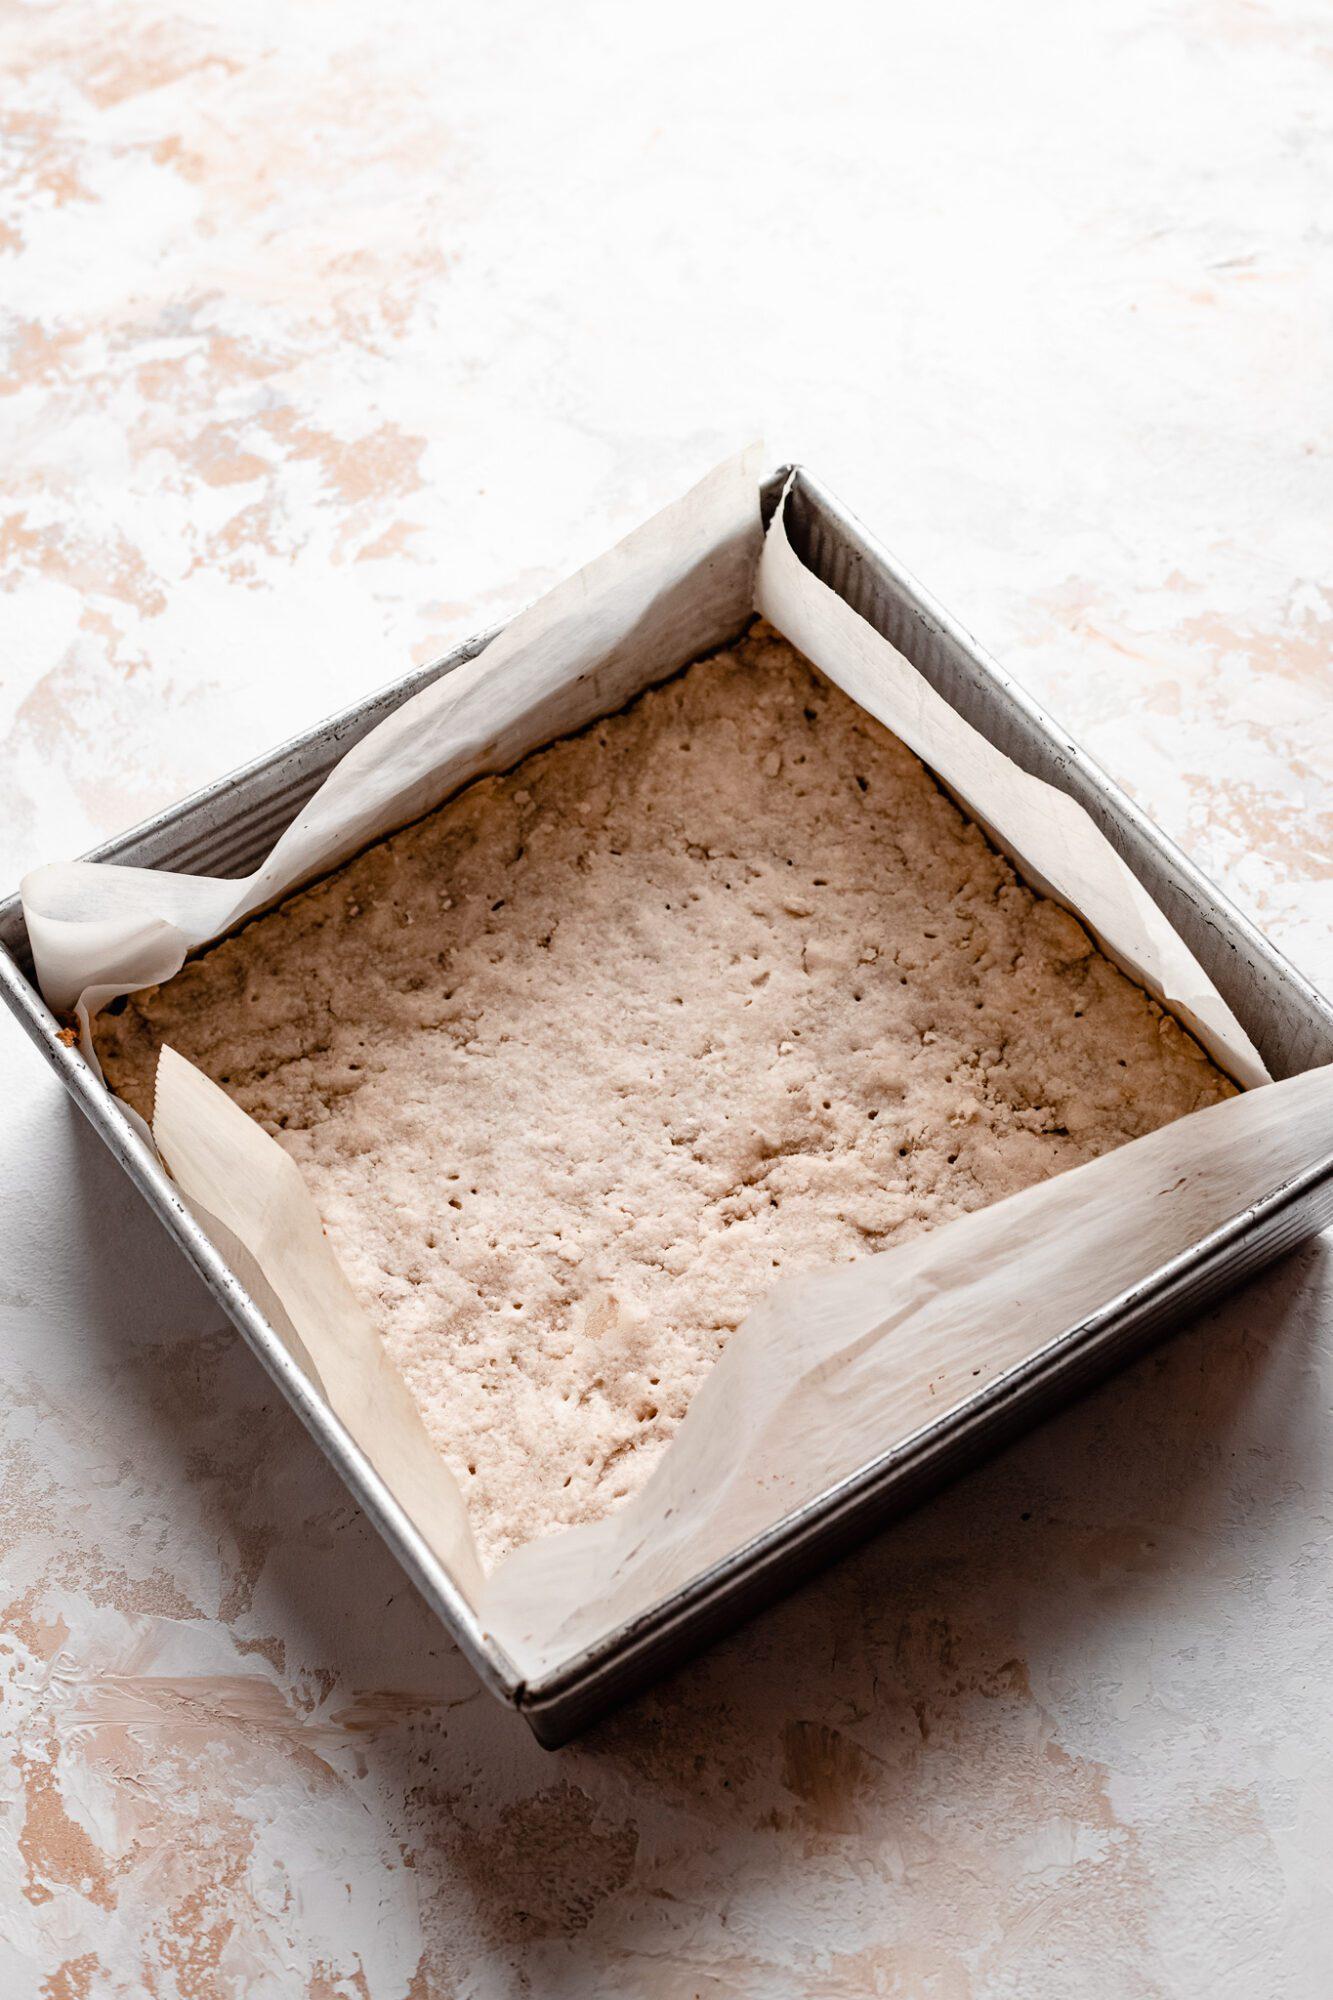 baked shortbread crust